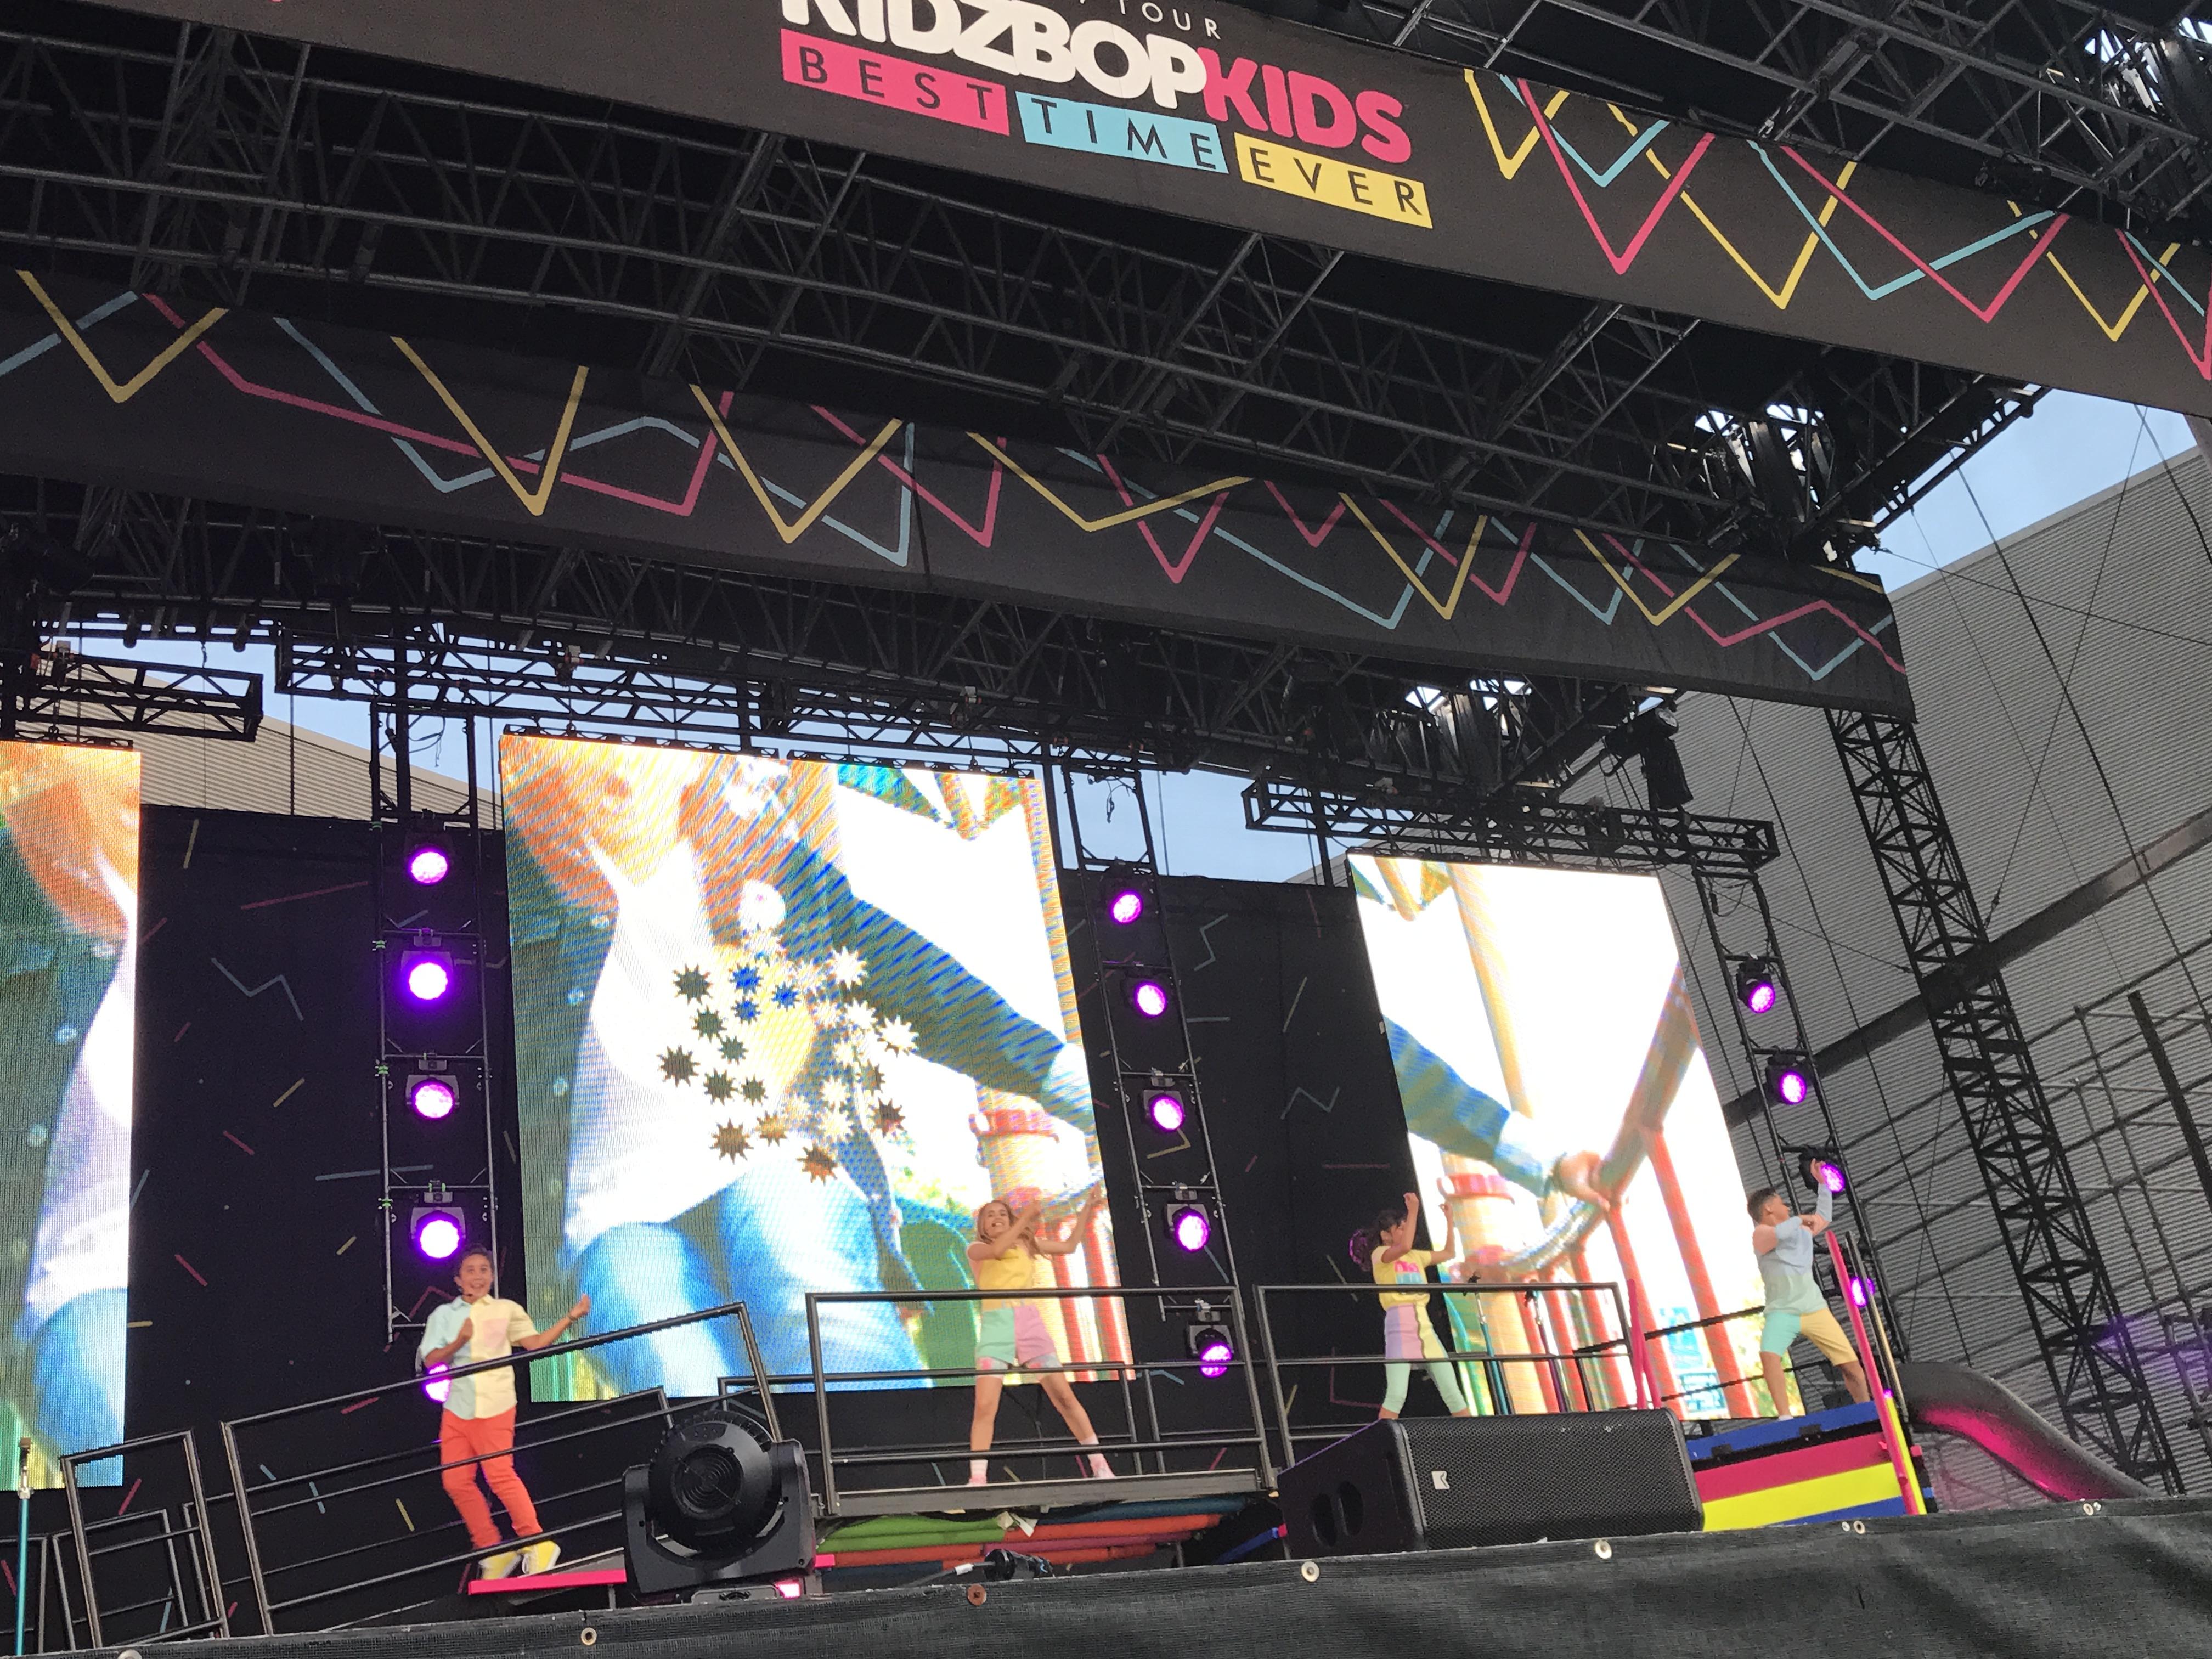 Kidz Bop Best Time Ever Tour June